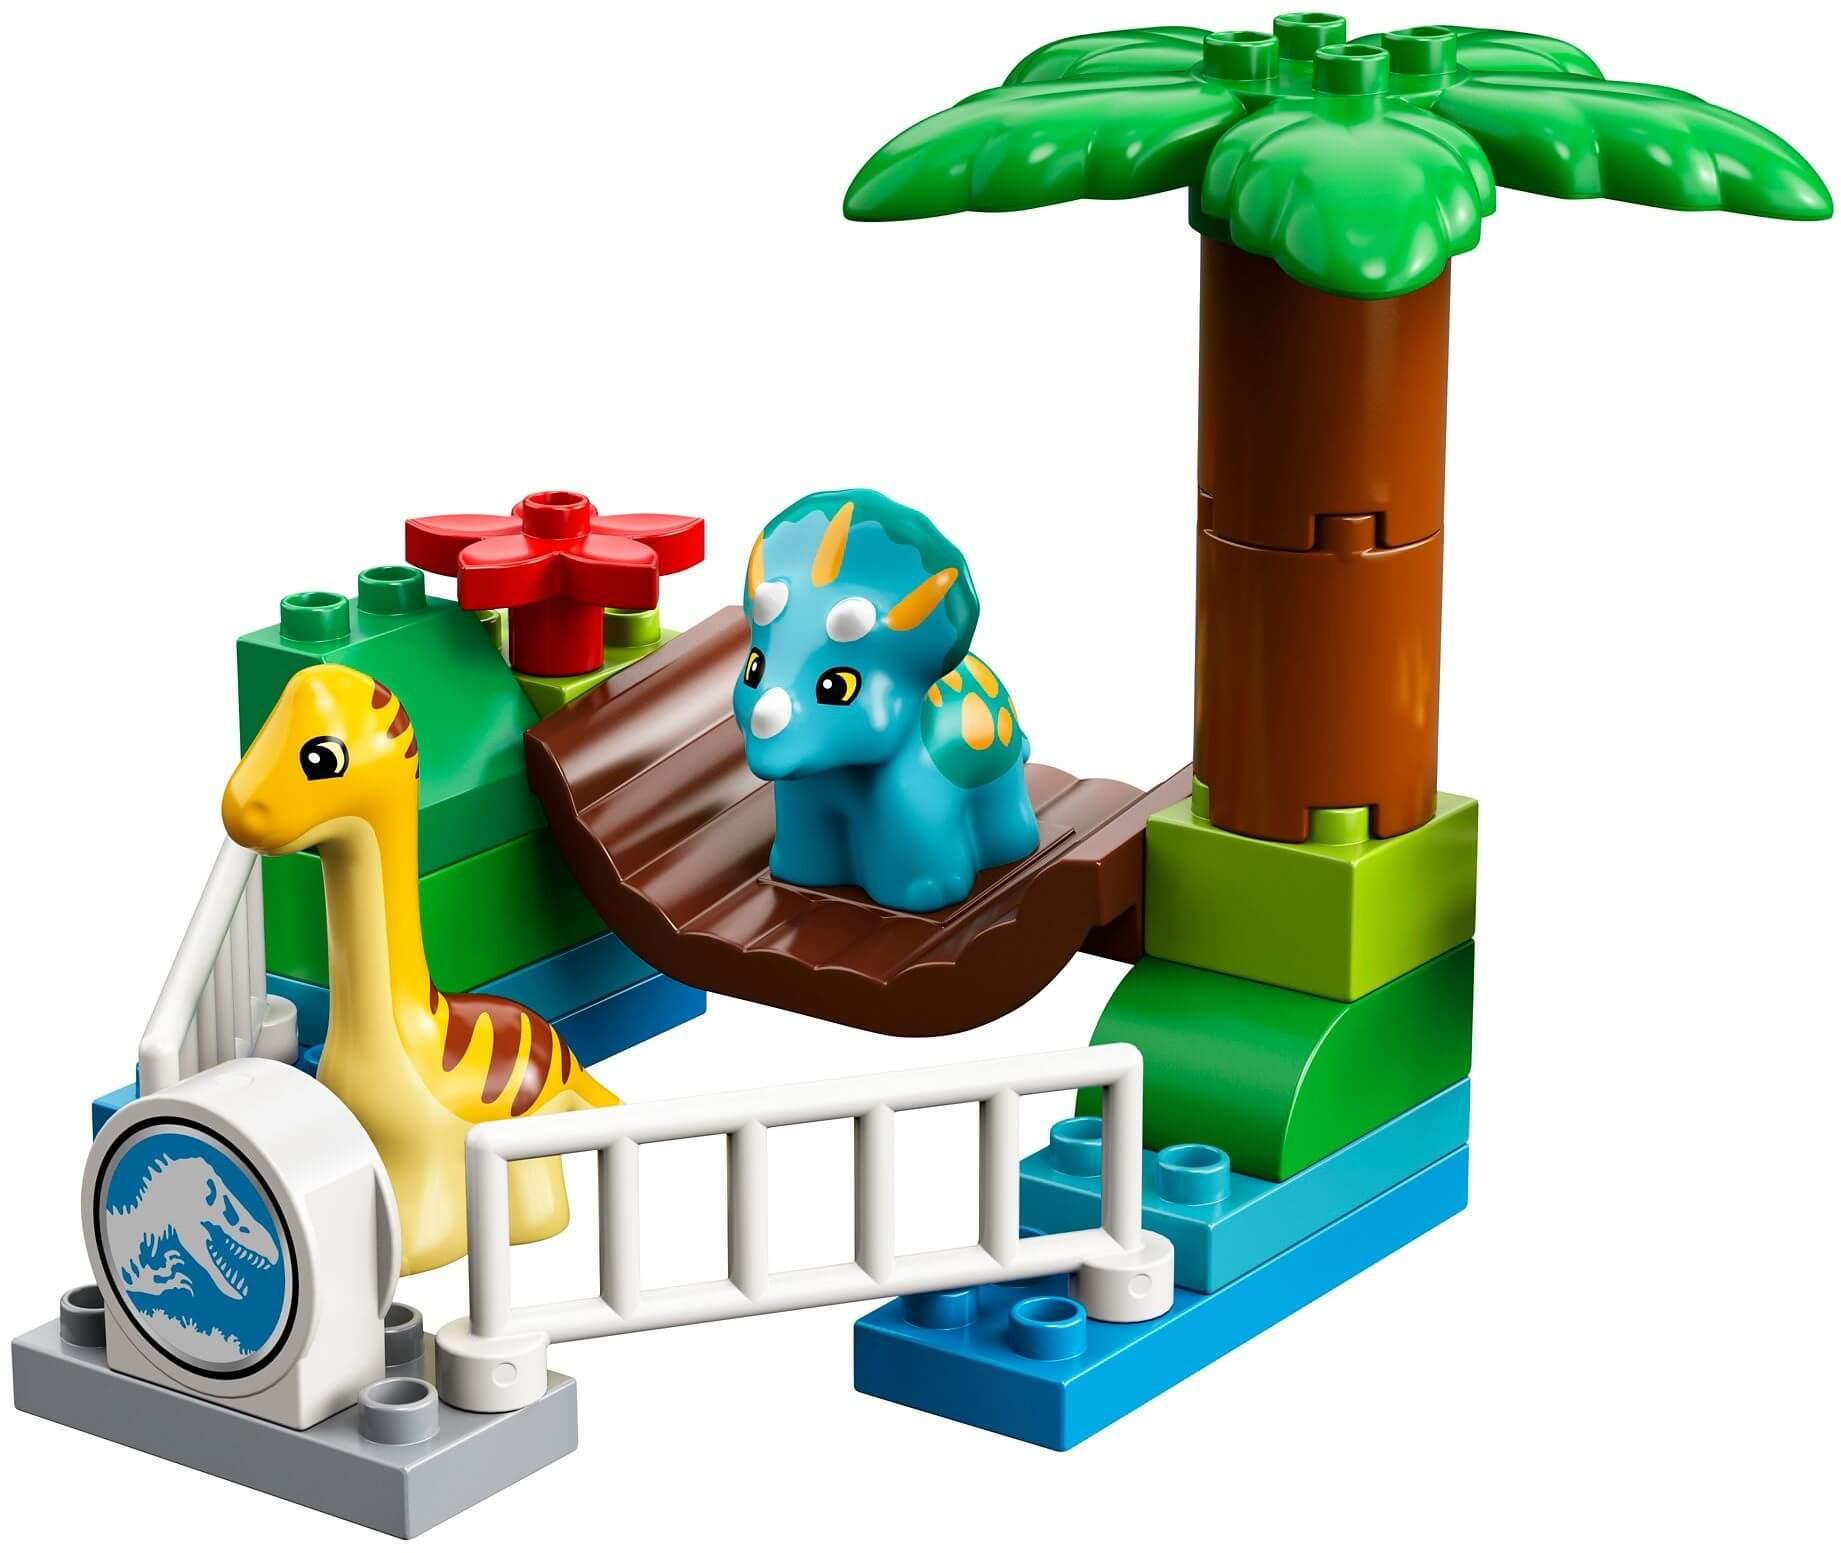 Mua đồ chơi LEGO 10879 - LEGO DUPLO 10879 - Xếp Hình Khủng Long của Bé (LEGO DUPLO 10879 Gentle Giants Petting Zoo)